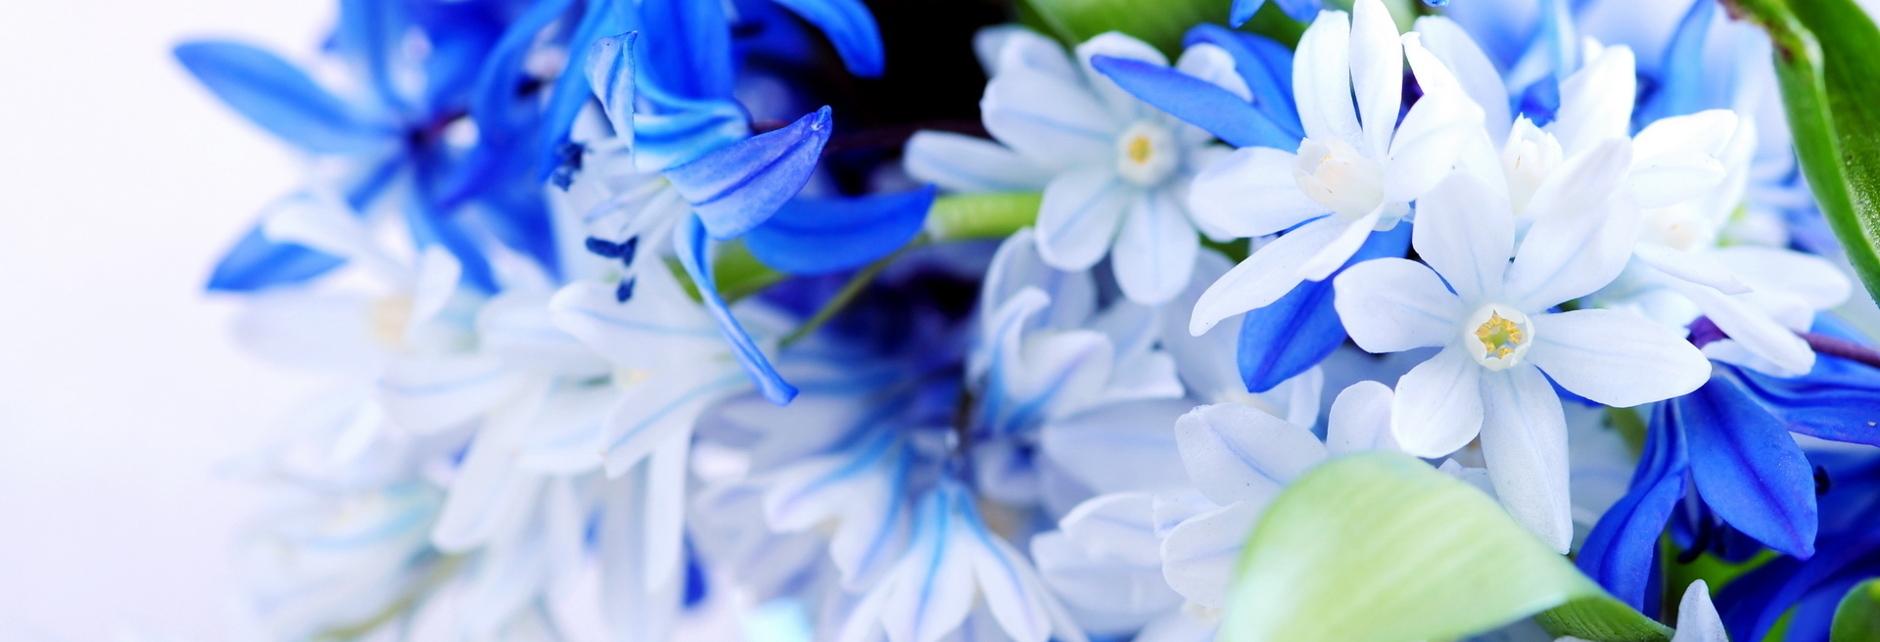 7001876-hd-flower-background.jpg